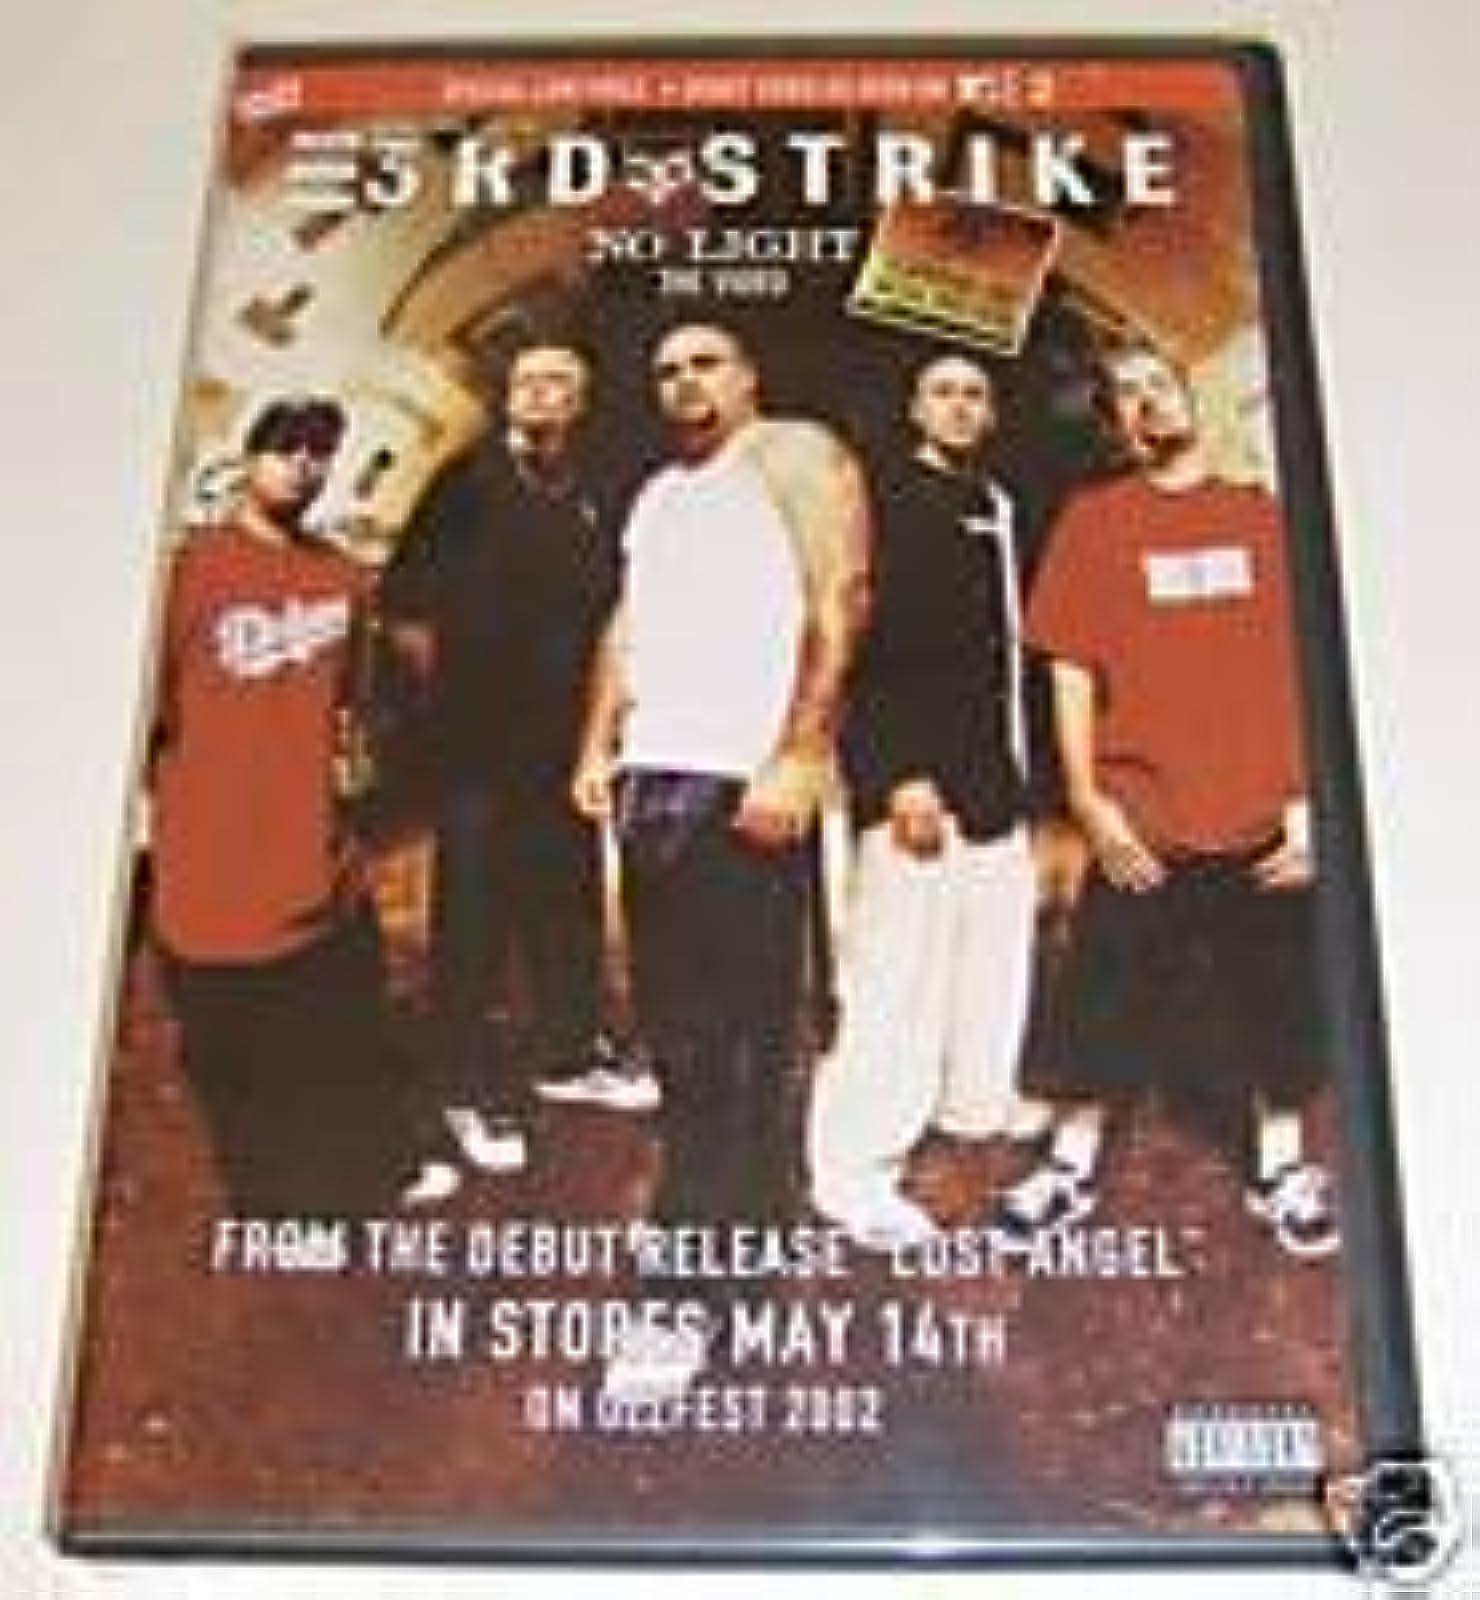 3rd Strike: No Light Movie On DVD